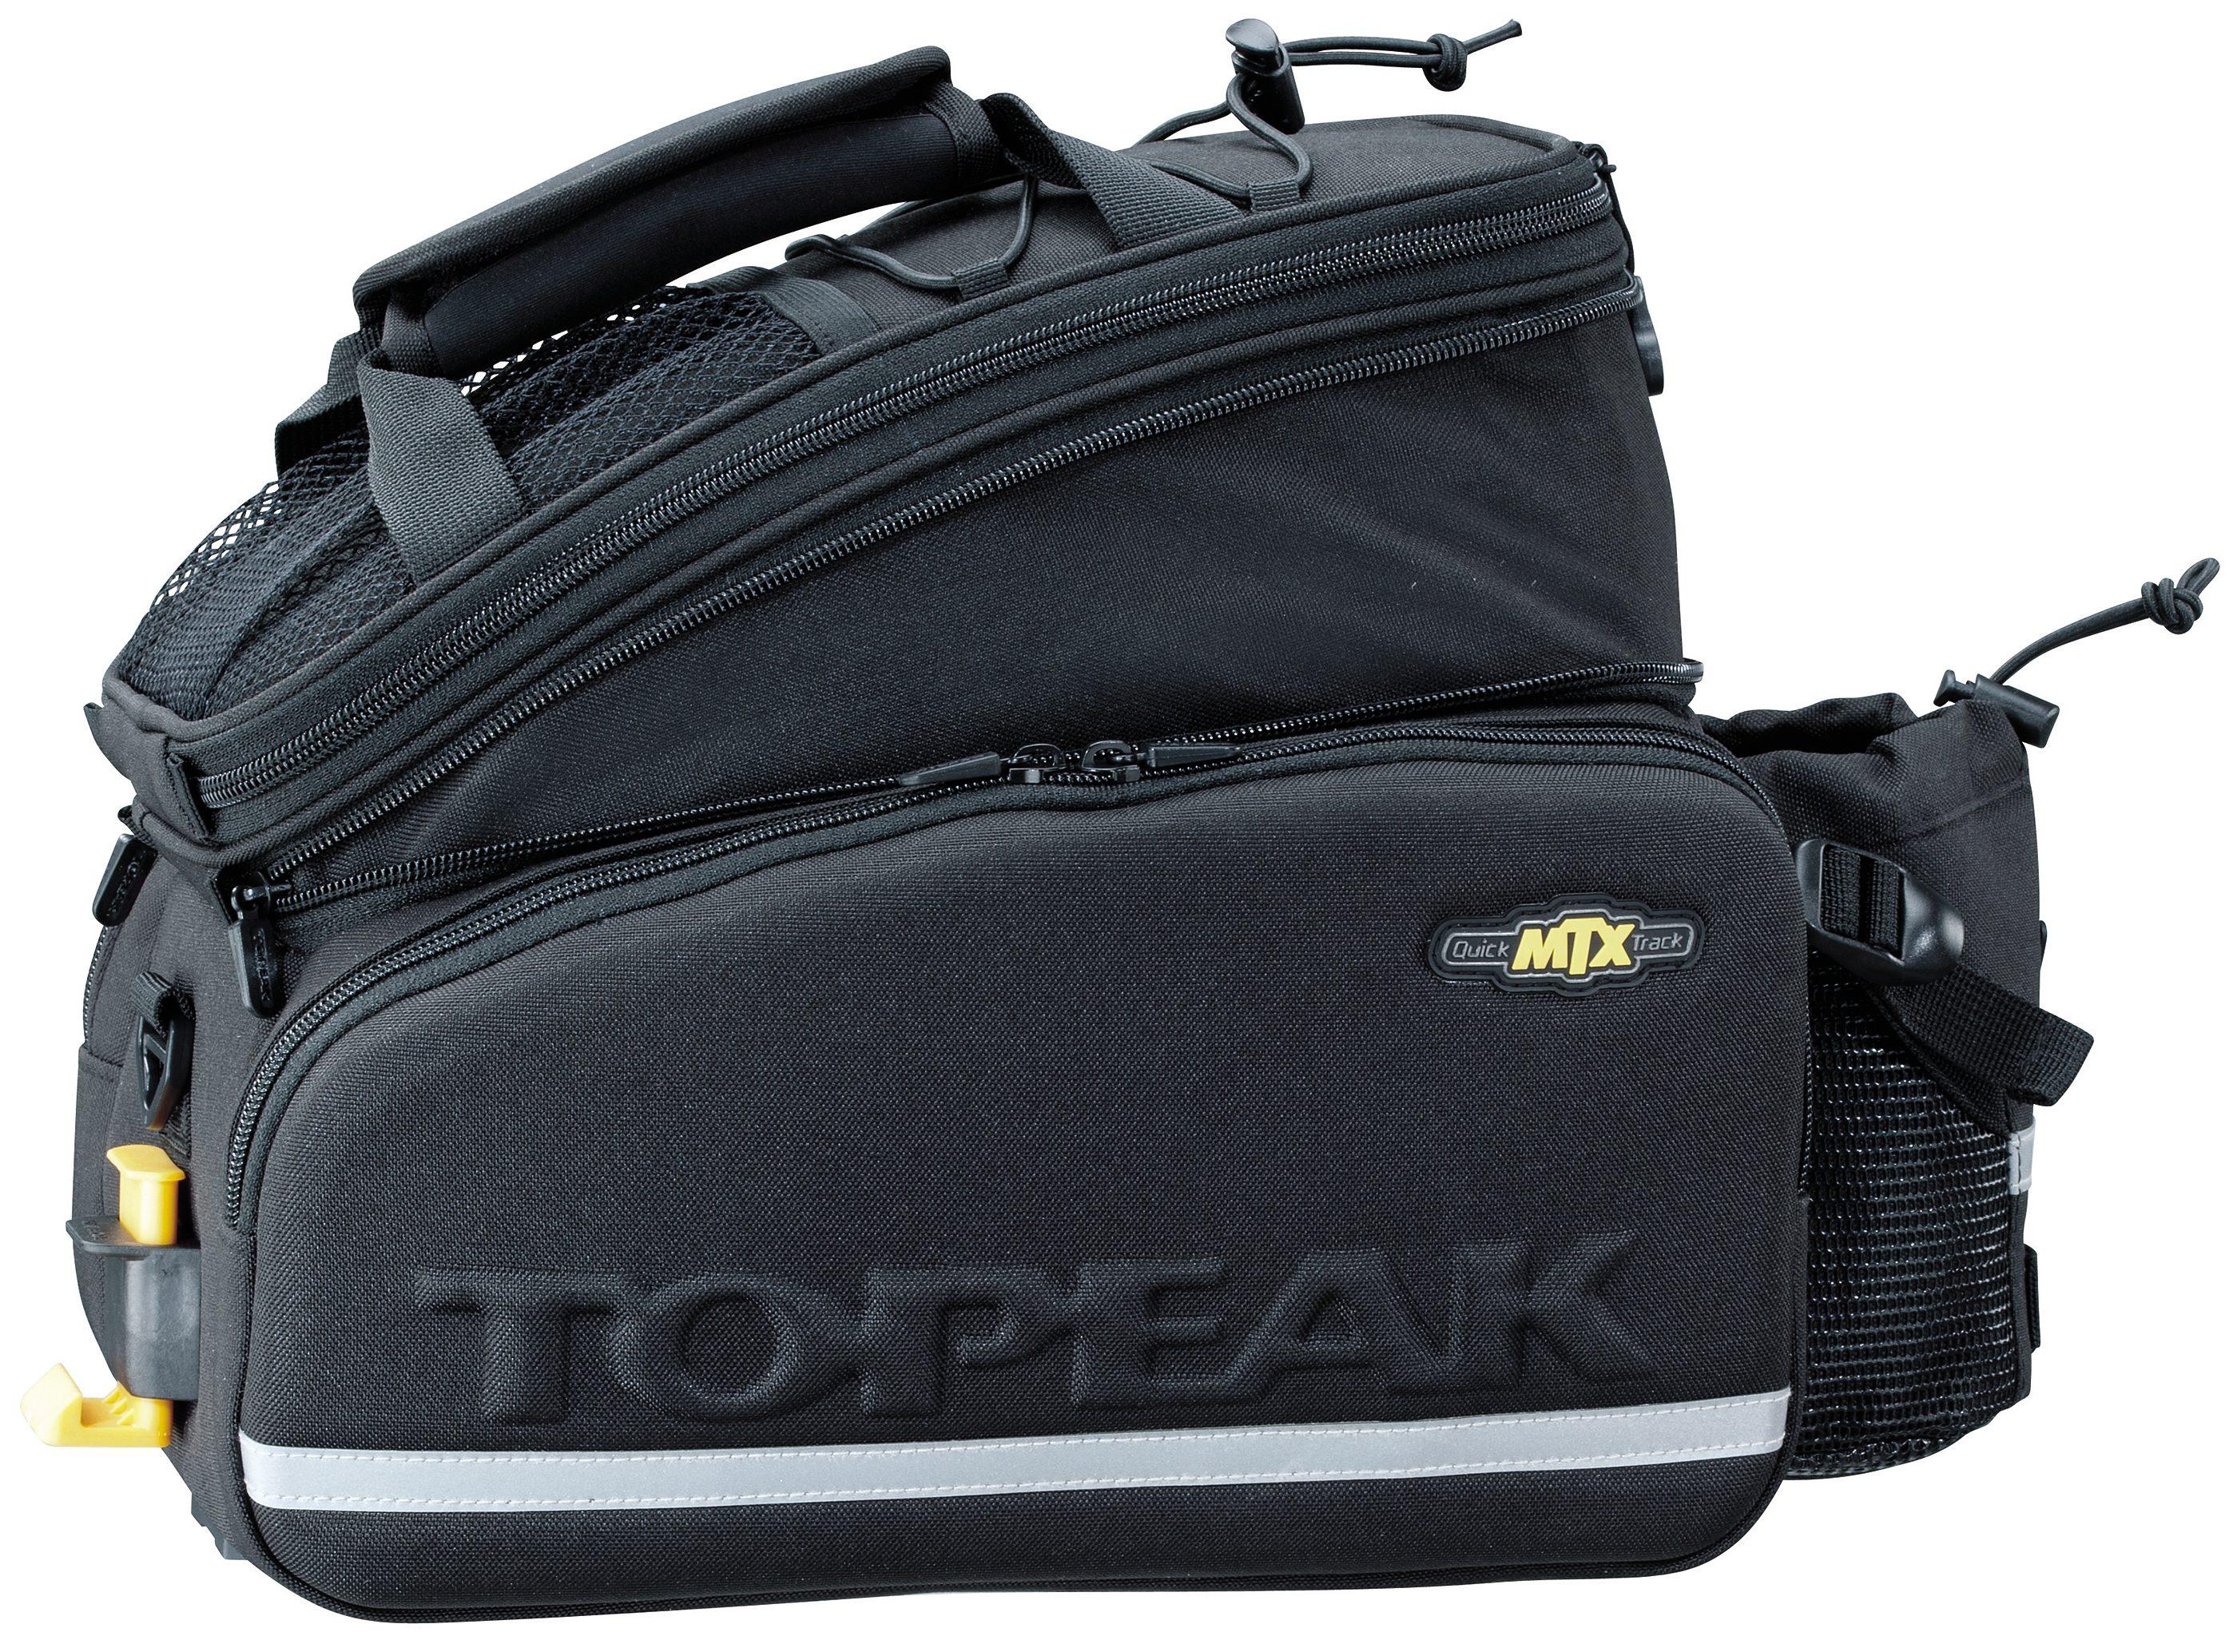 Topeak Gepäckträgertasche »MTX Trunk Bag DX«